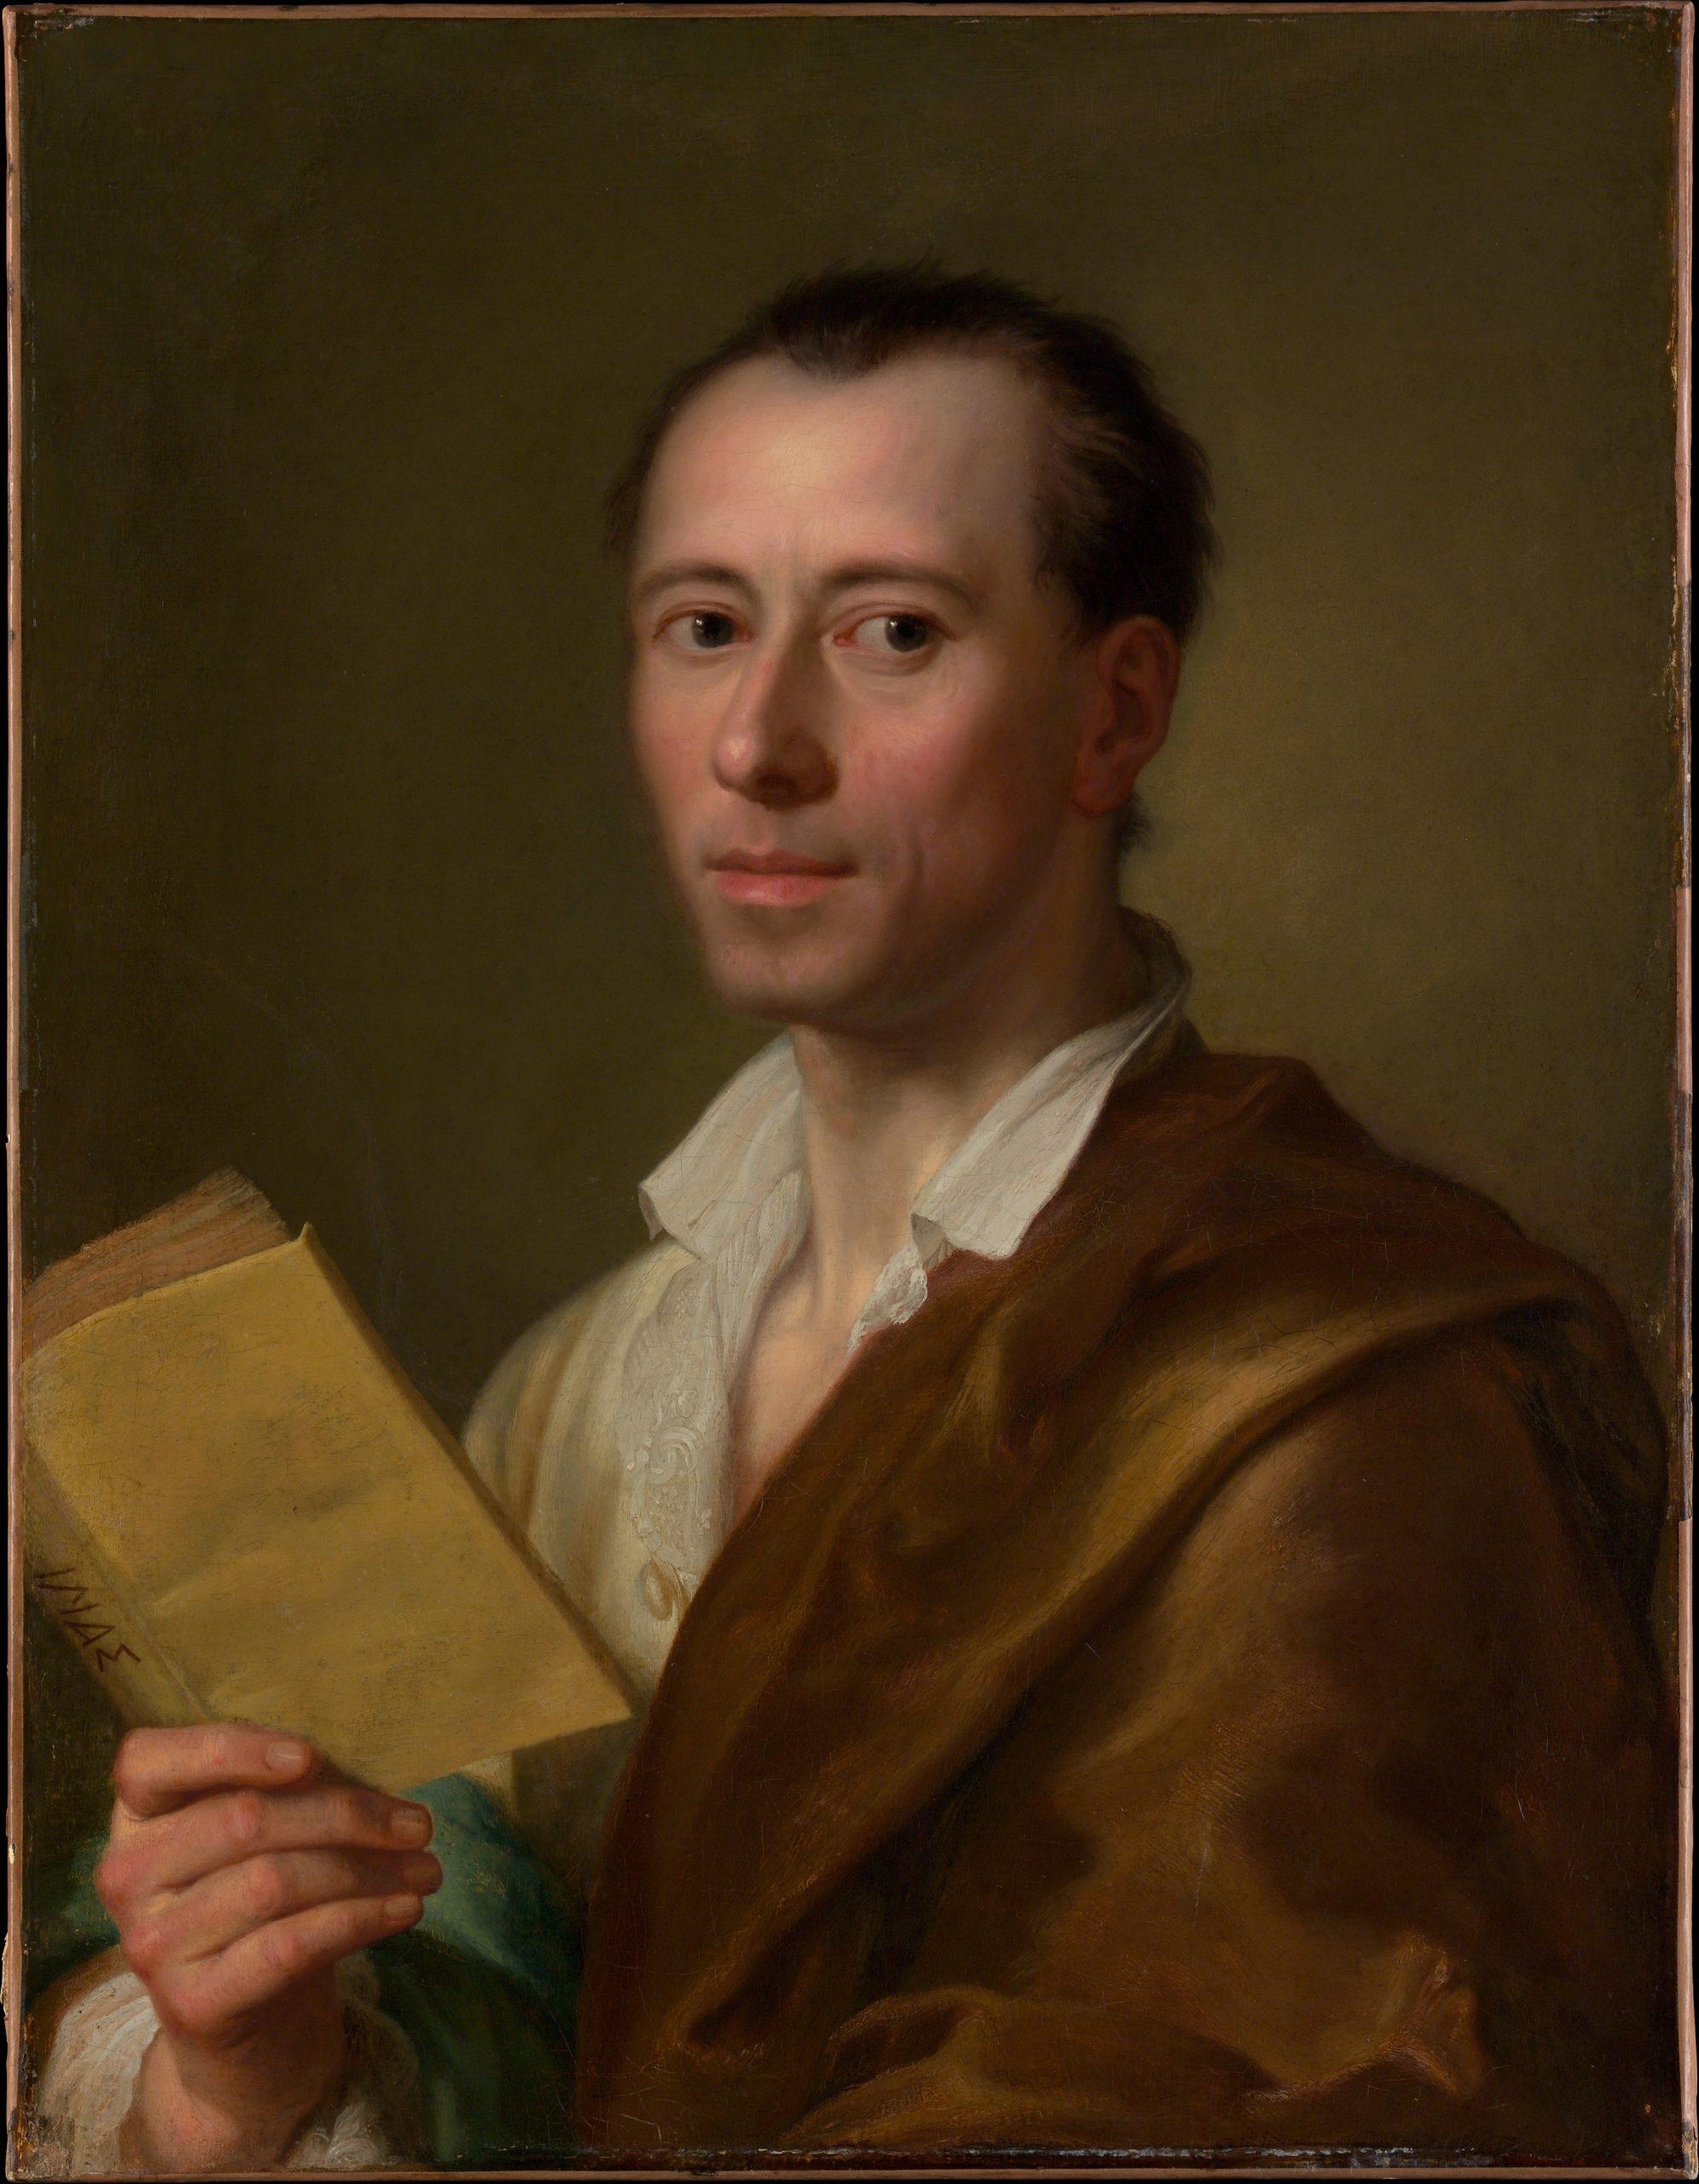 Porträt Winckelmanns von Anton Raphael Mengs, 1755, Bild: Metropolitan Museum of Art, online collection, CC0 1.0 Universal, https://creativecommons.org/publicdomain/zero/1.0/legalcode